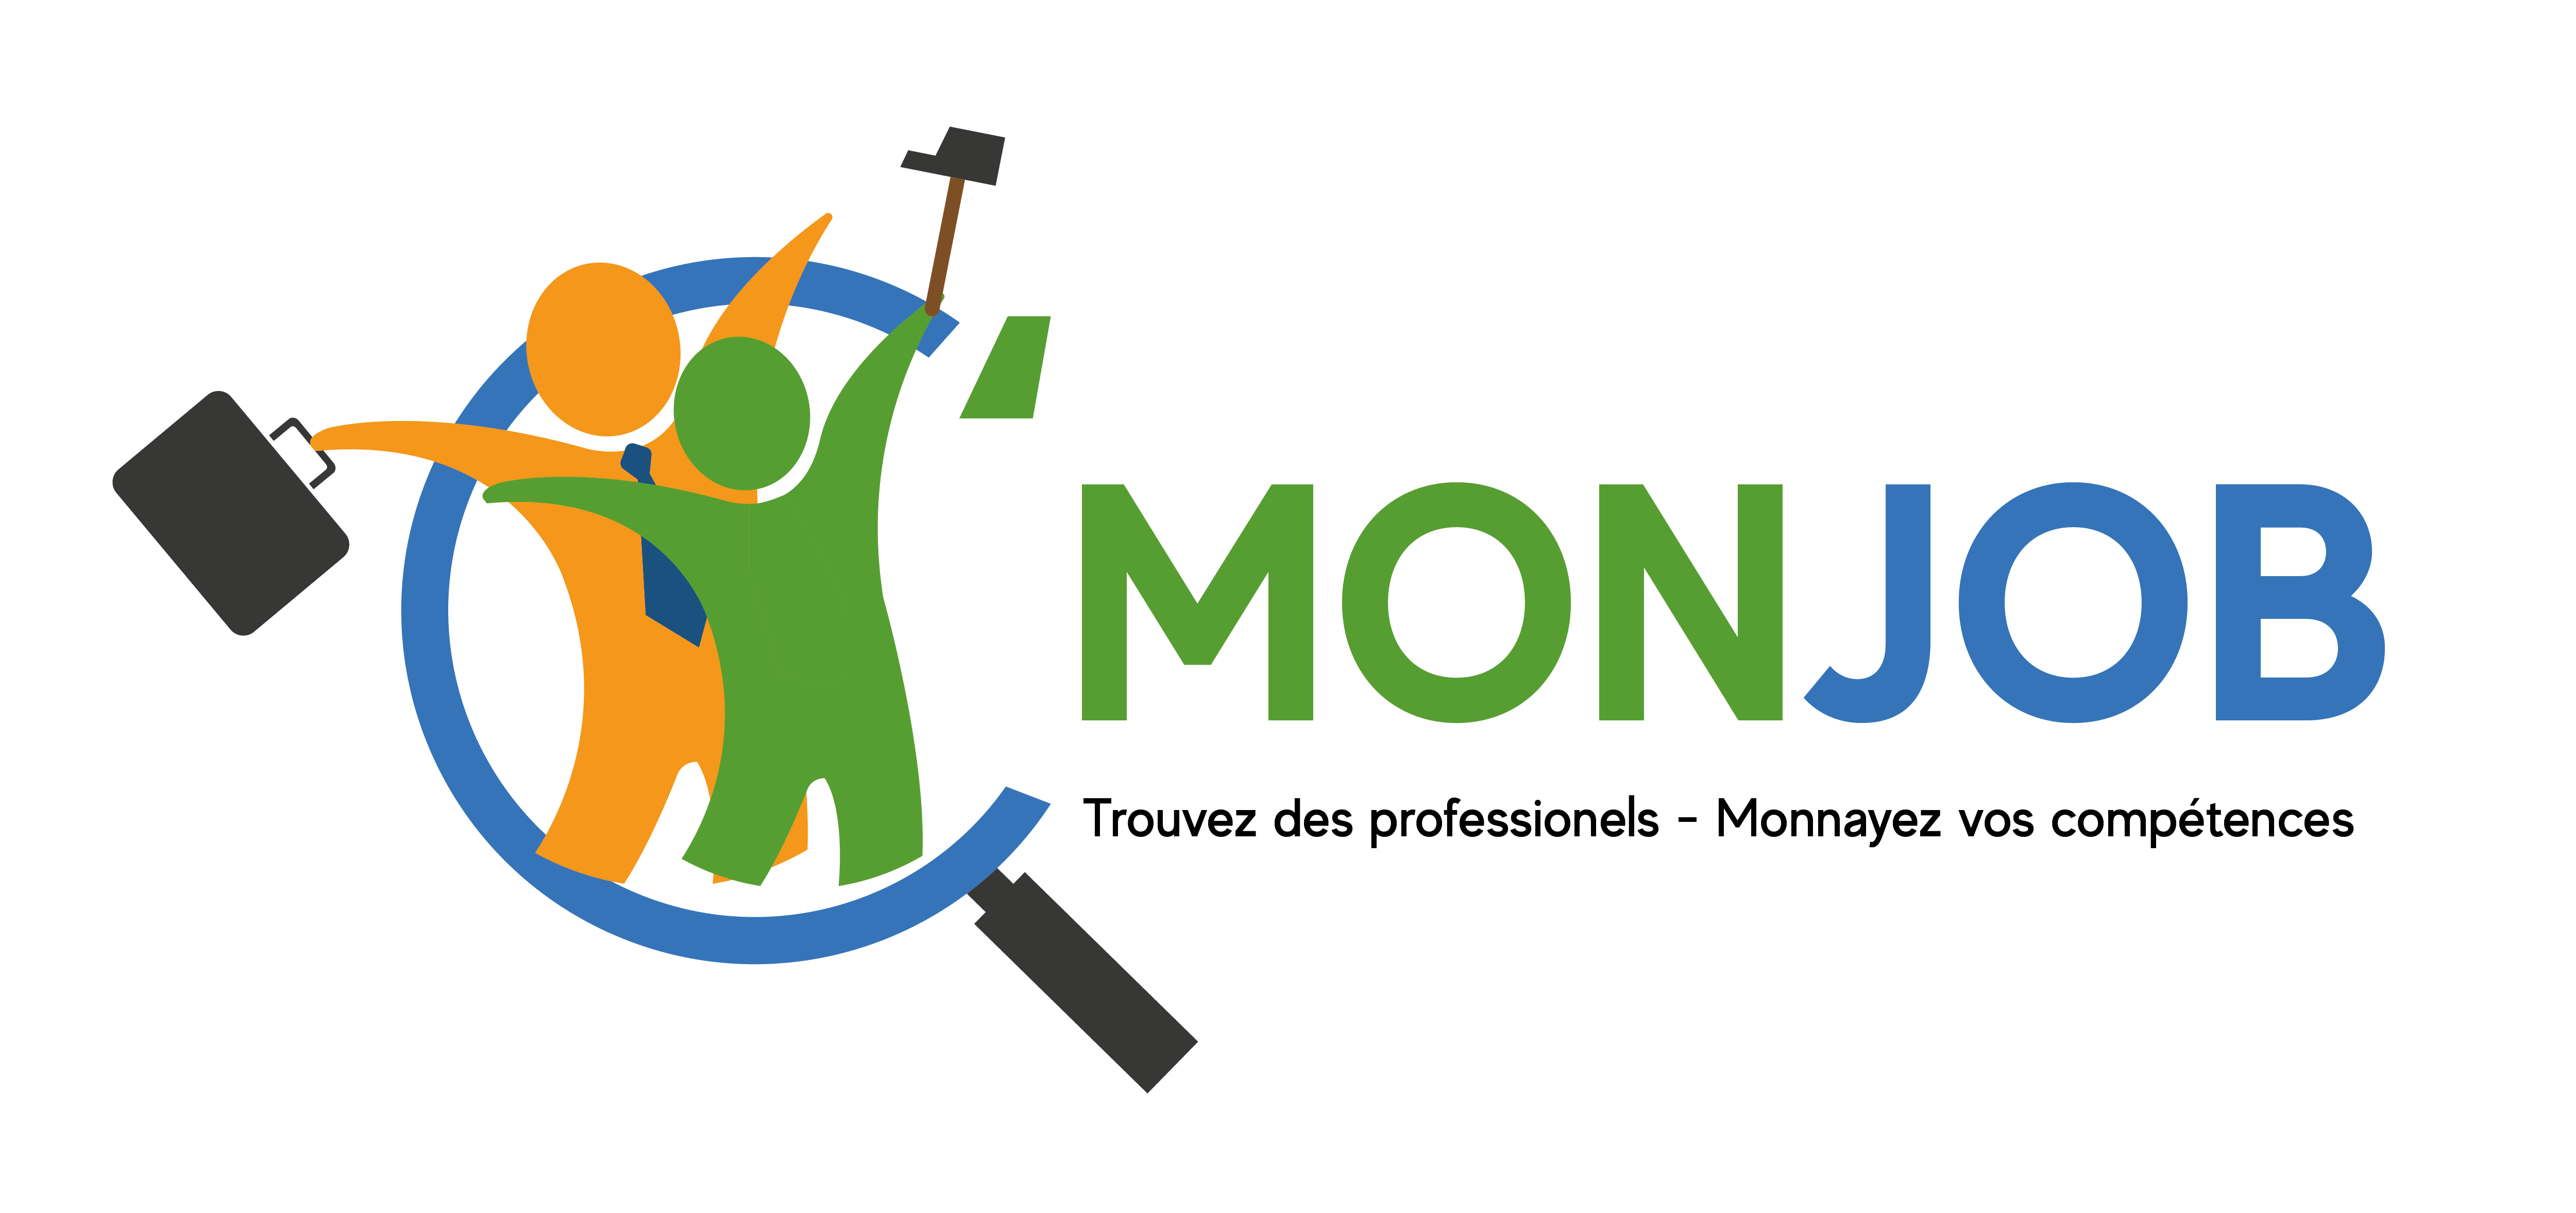 C'MonJob